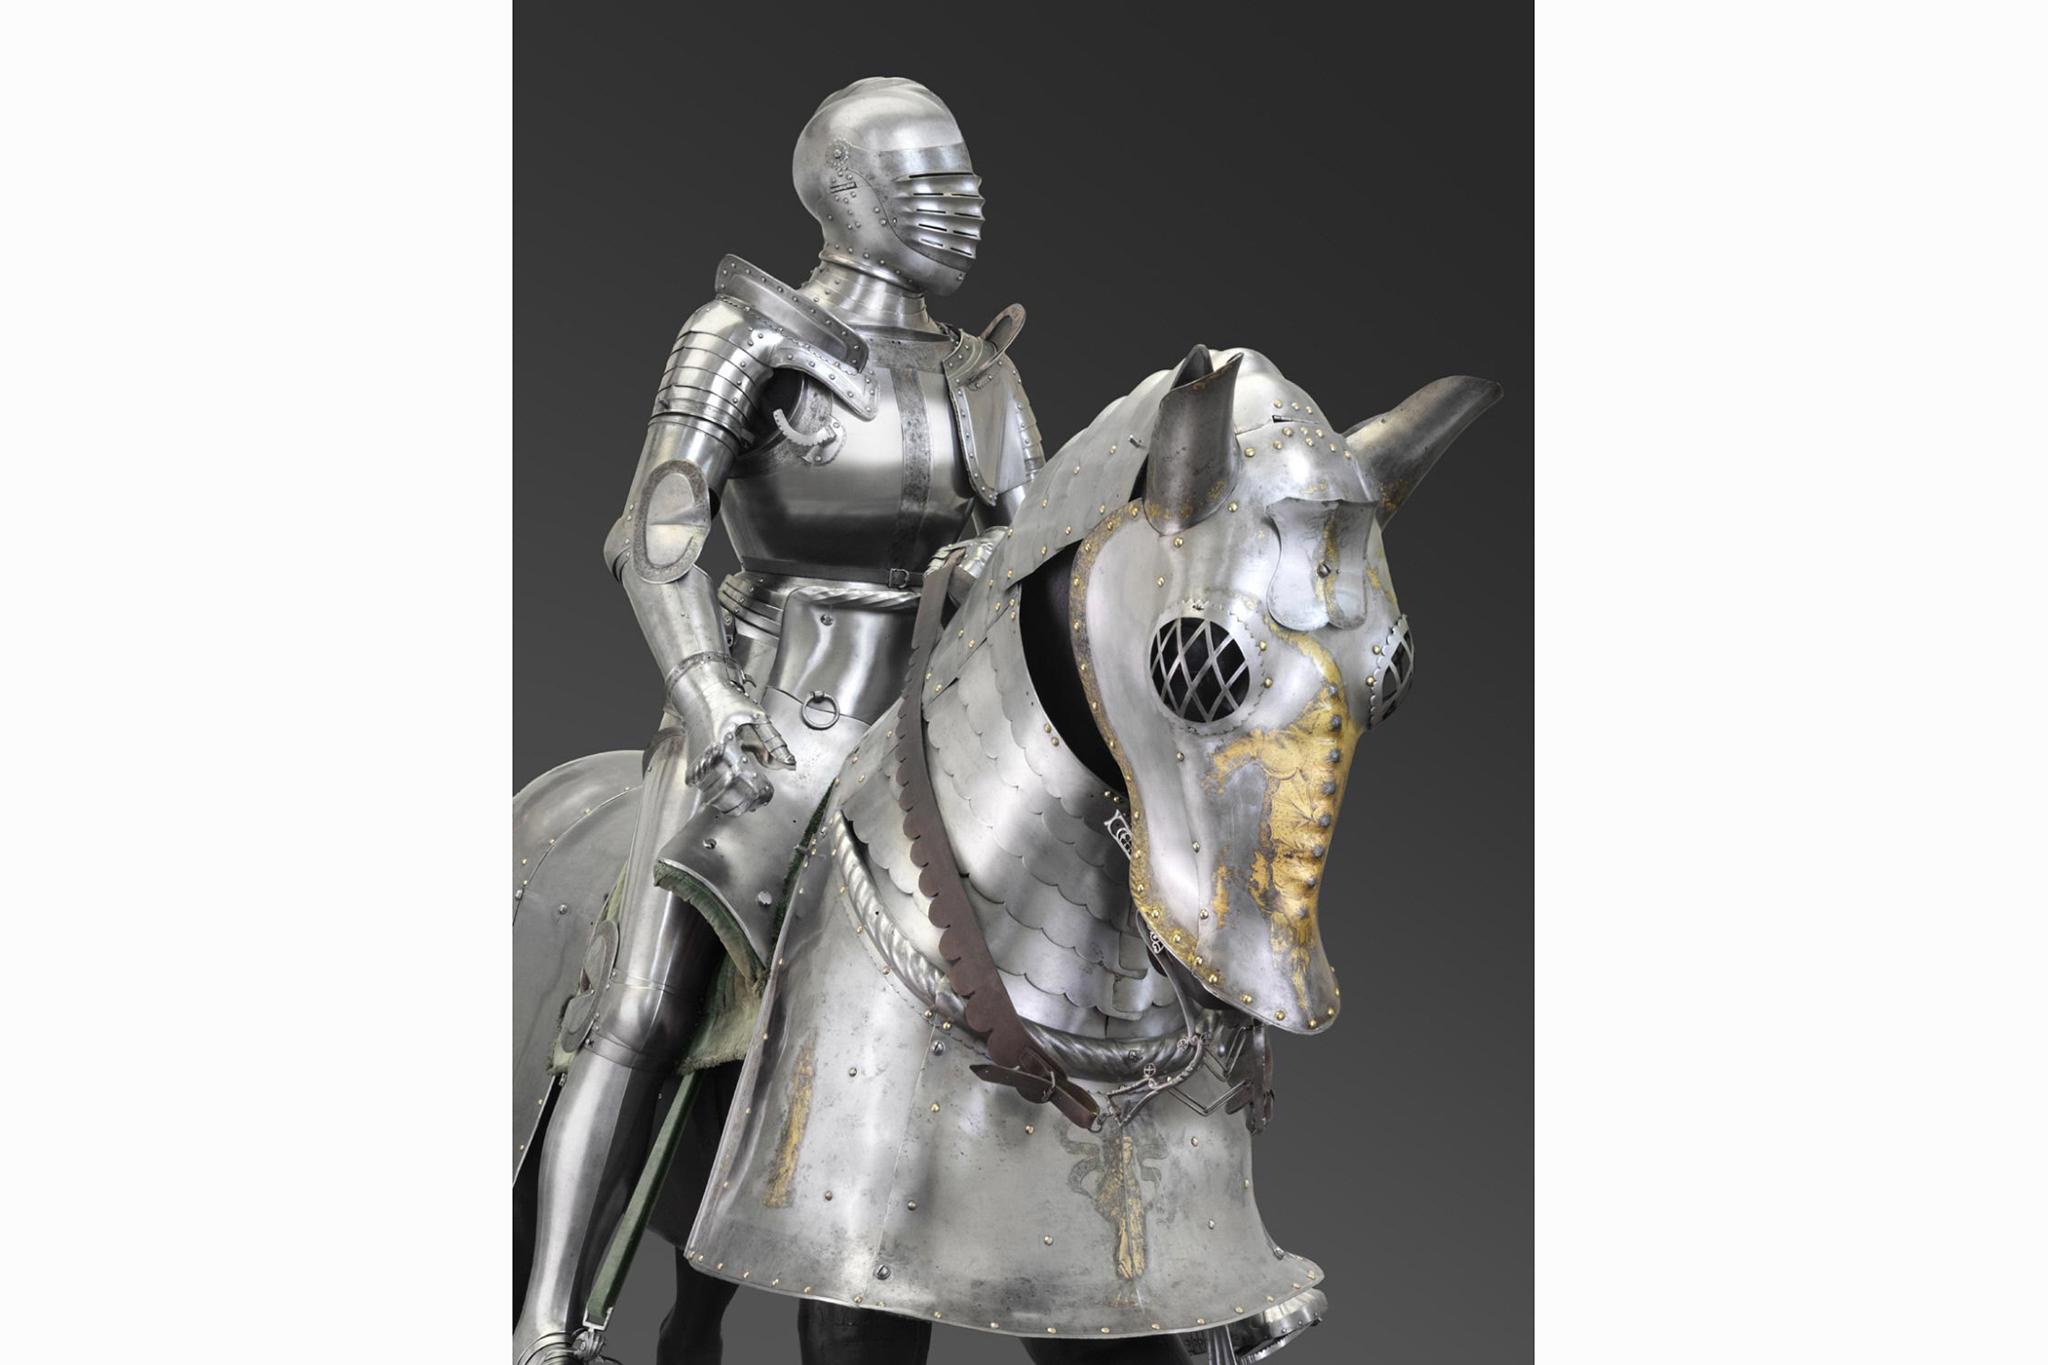 The Carl Otto Kretzschmar von Kienbusch Collection—arms and armor, @1300s-1700s.